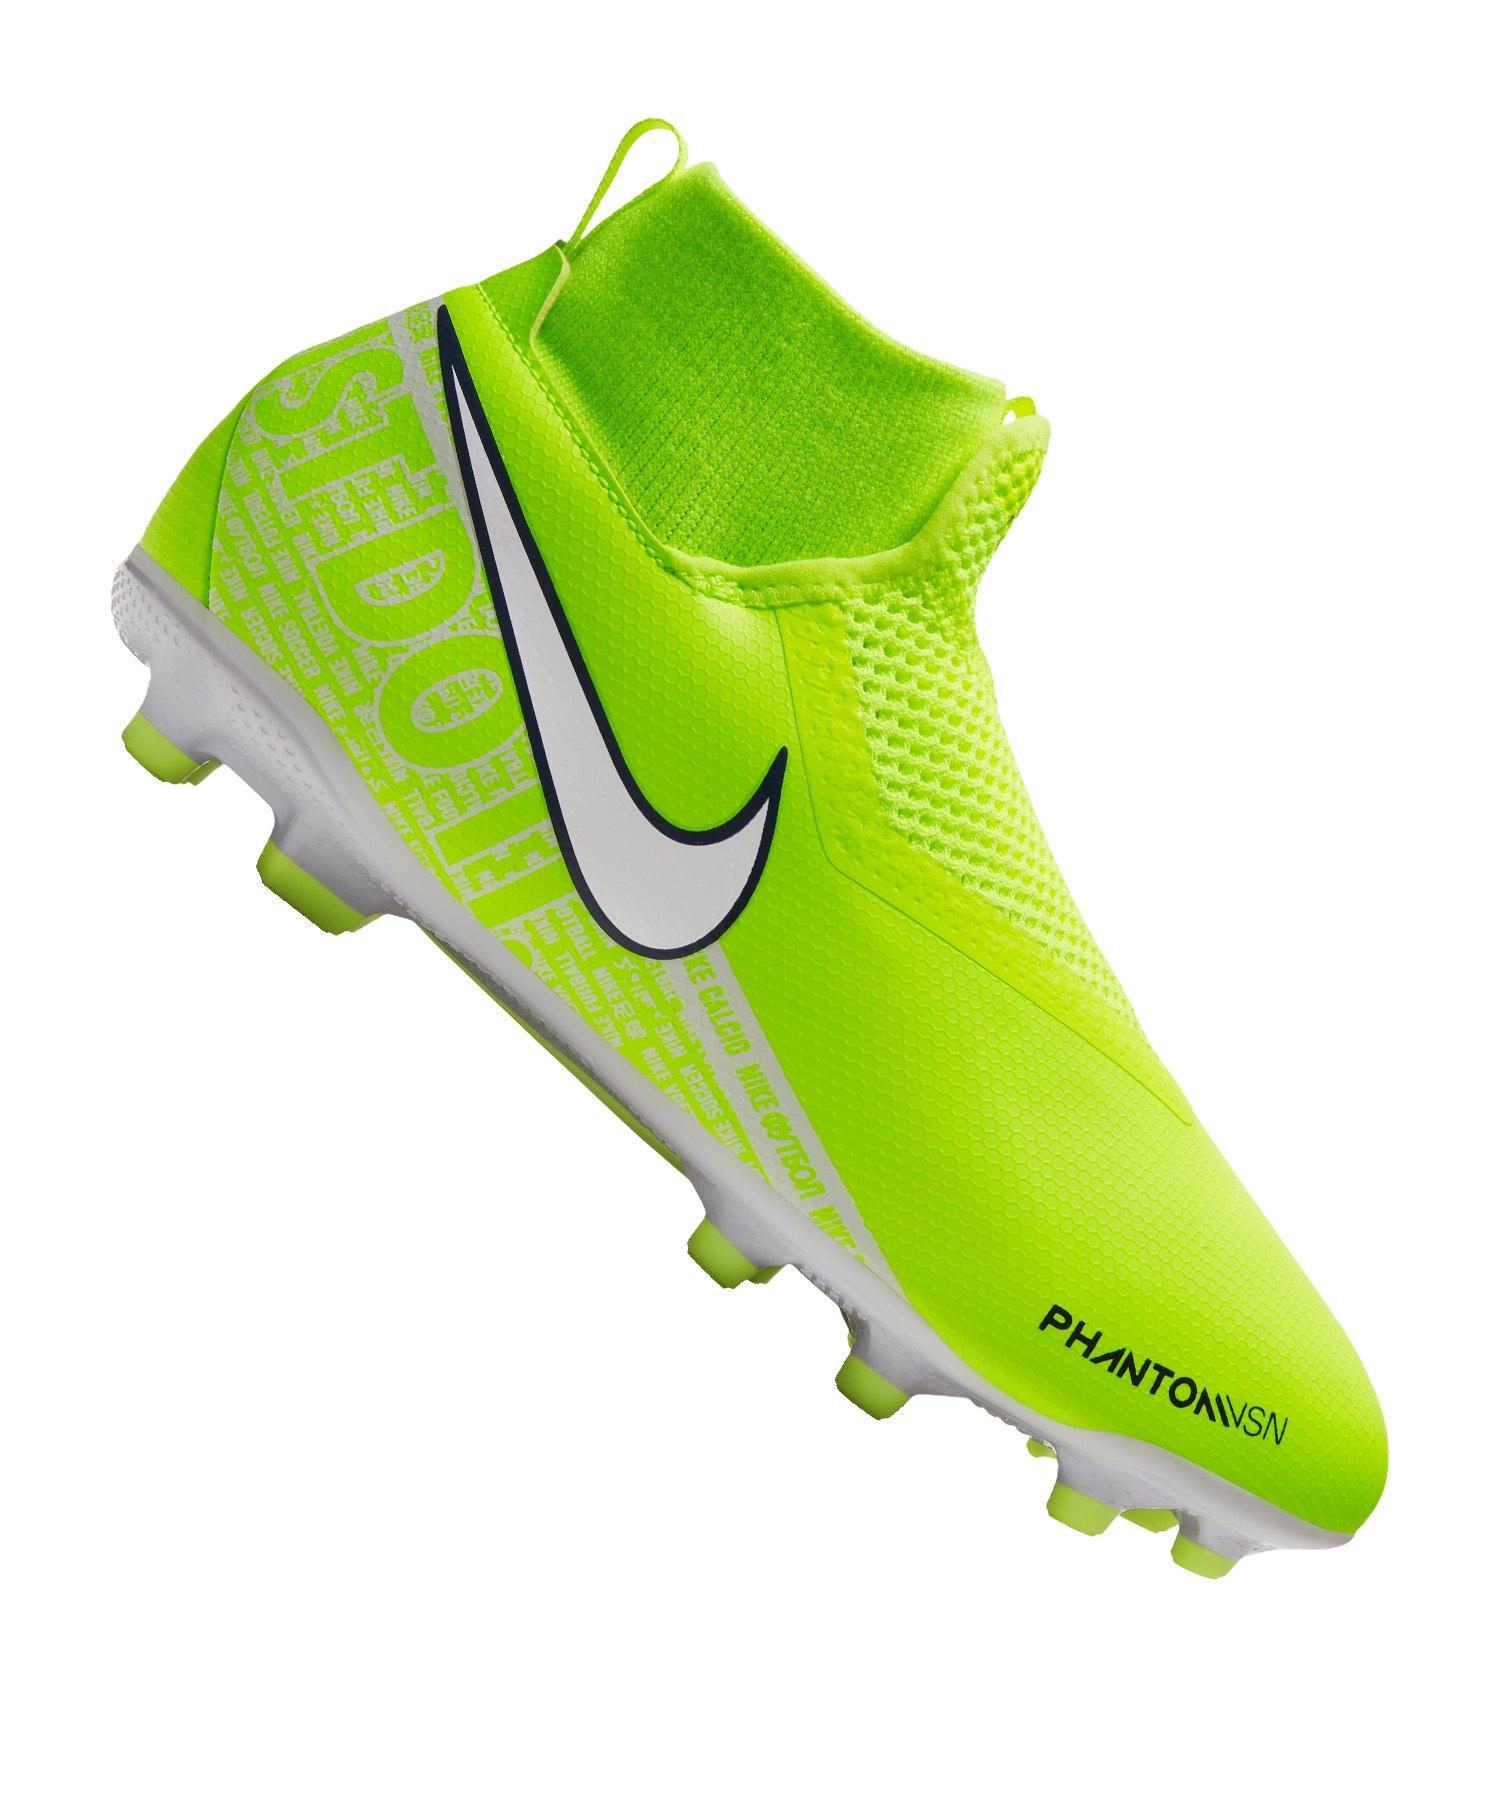 Nike Phantom Vision Academy DF MG Kids Gelb F717 - gelb